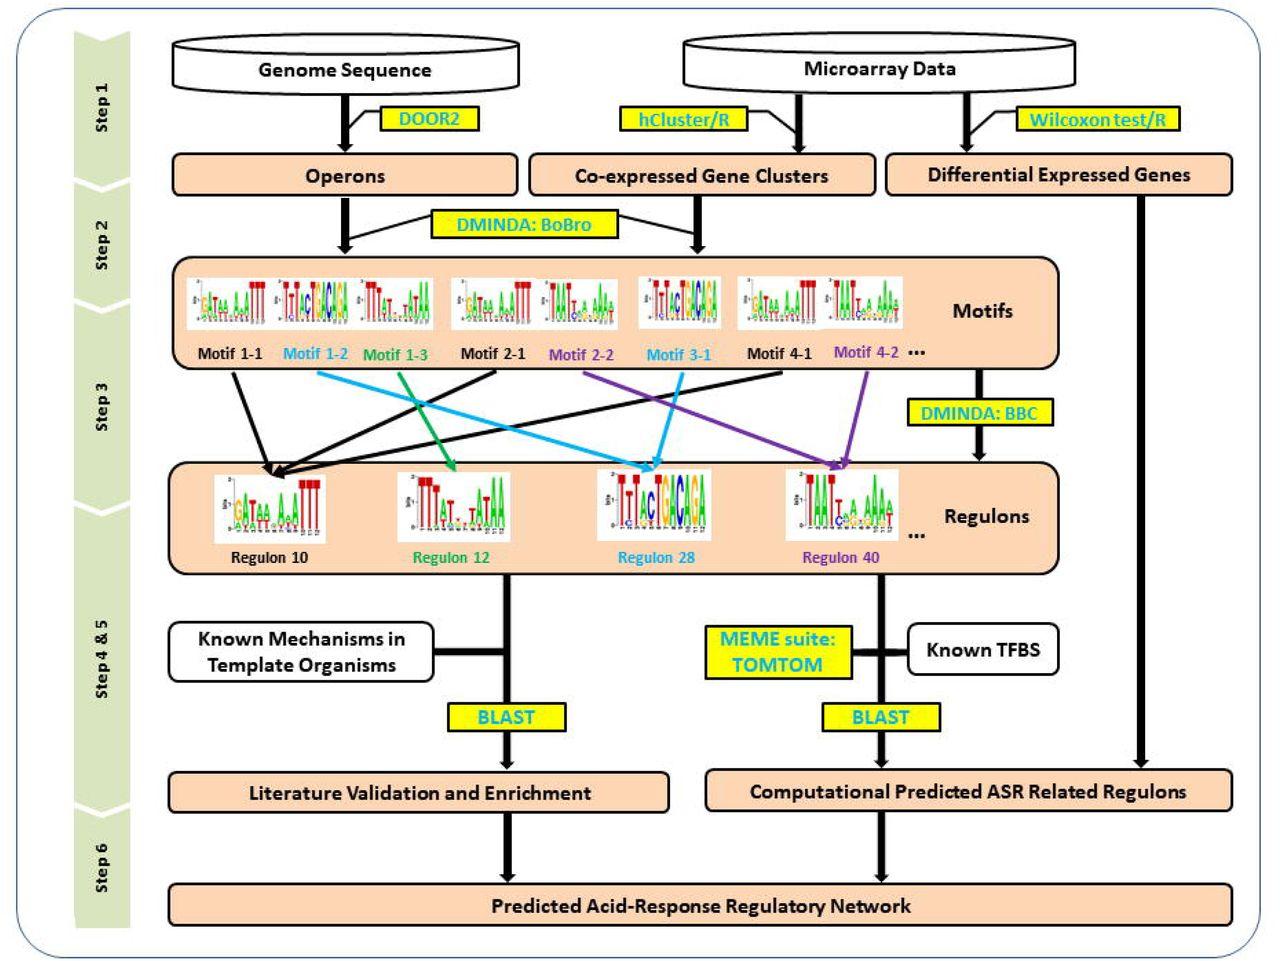 RECTA: Regulon Identification Based on Comparative Genomics